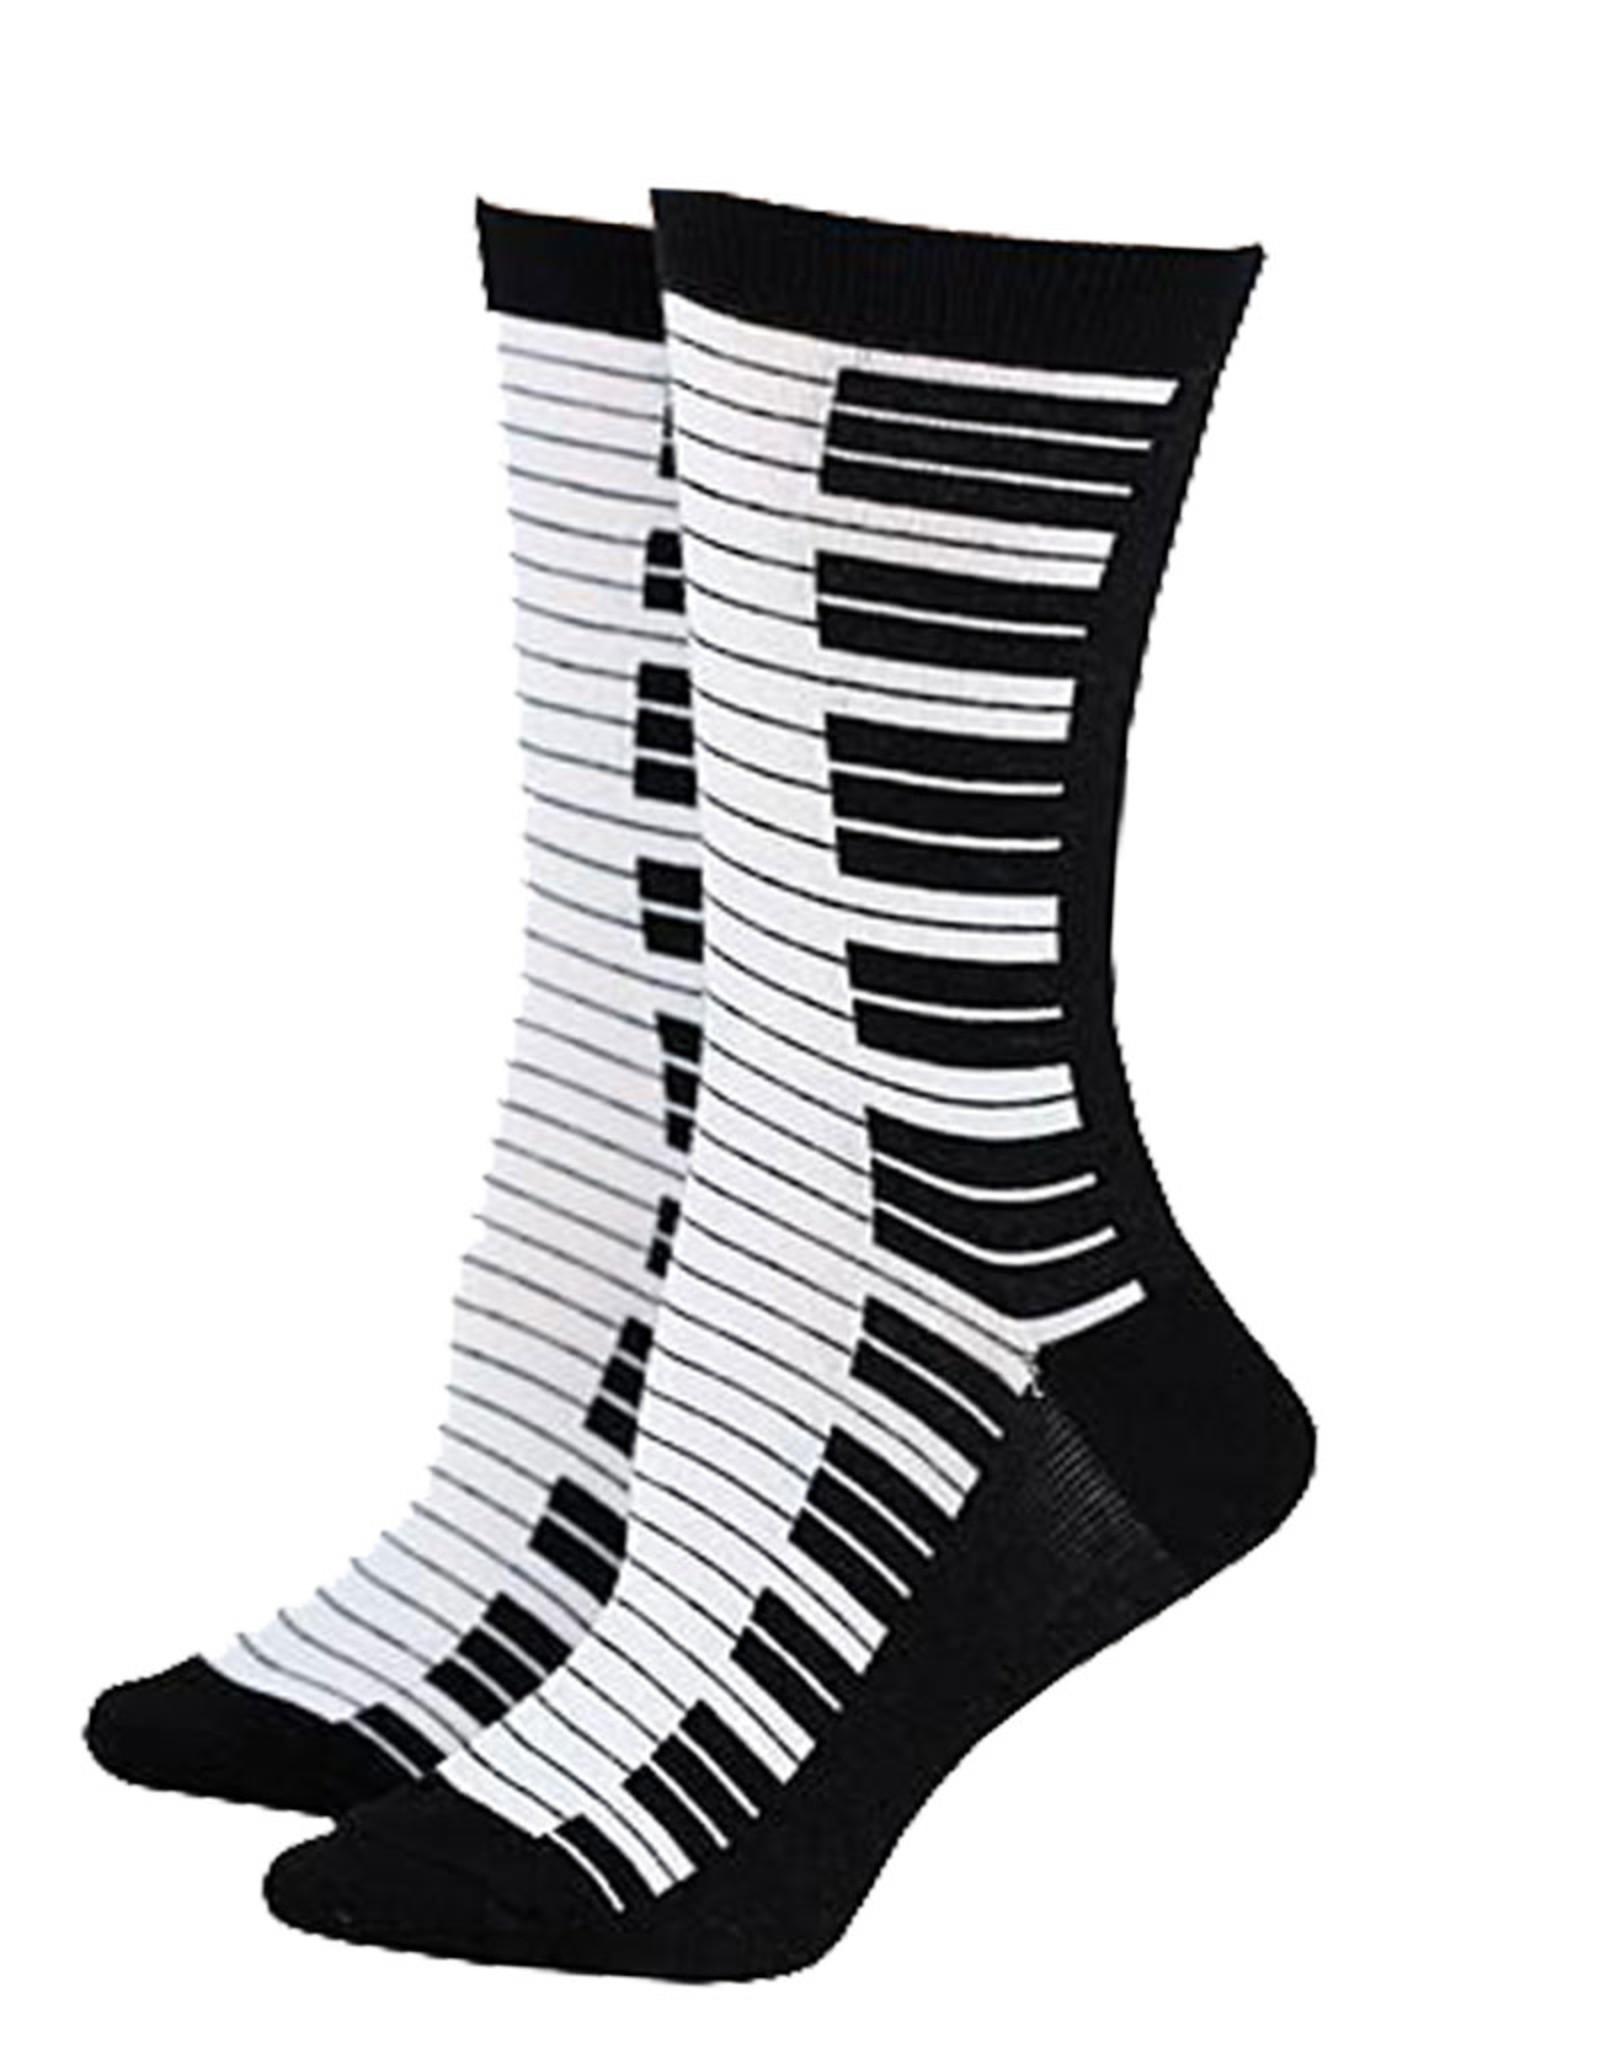 Piano ( Cool Socks Sock )